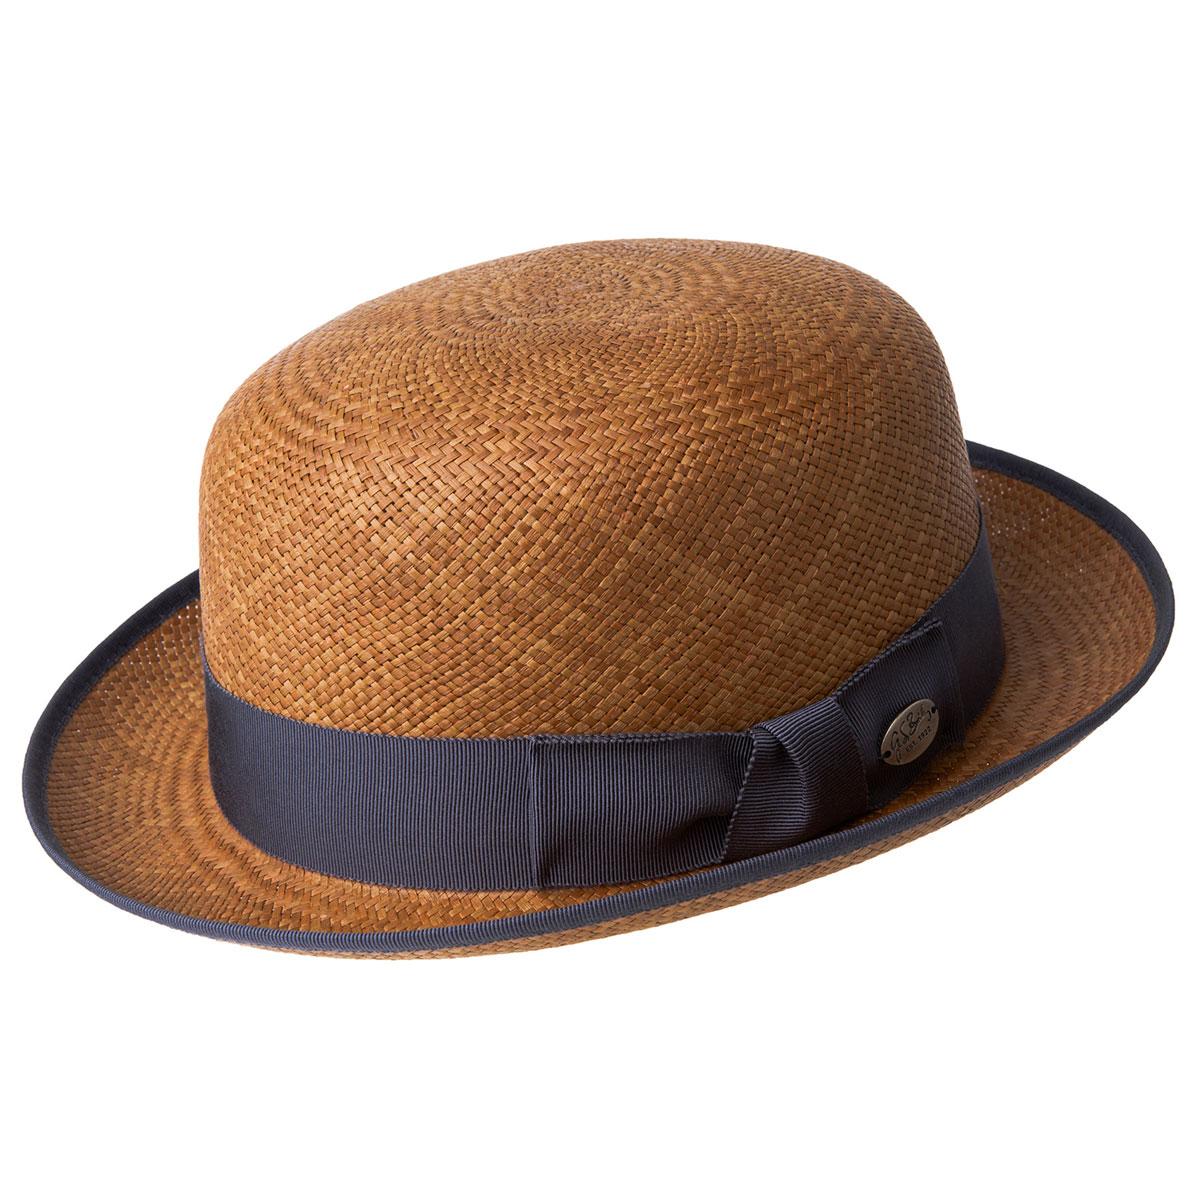 New Edwardian Style Men's Hats 1900-1920 Chaplin Panama Bowler $160.00 AT vintagedancer.com